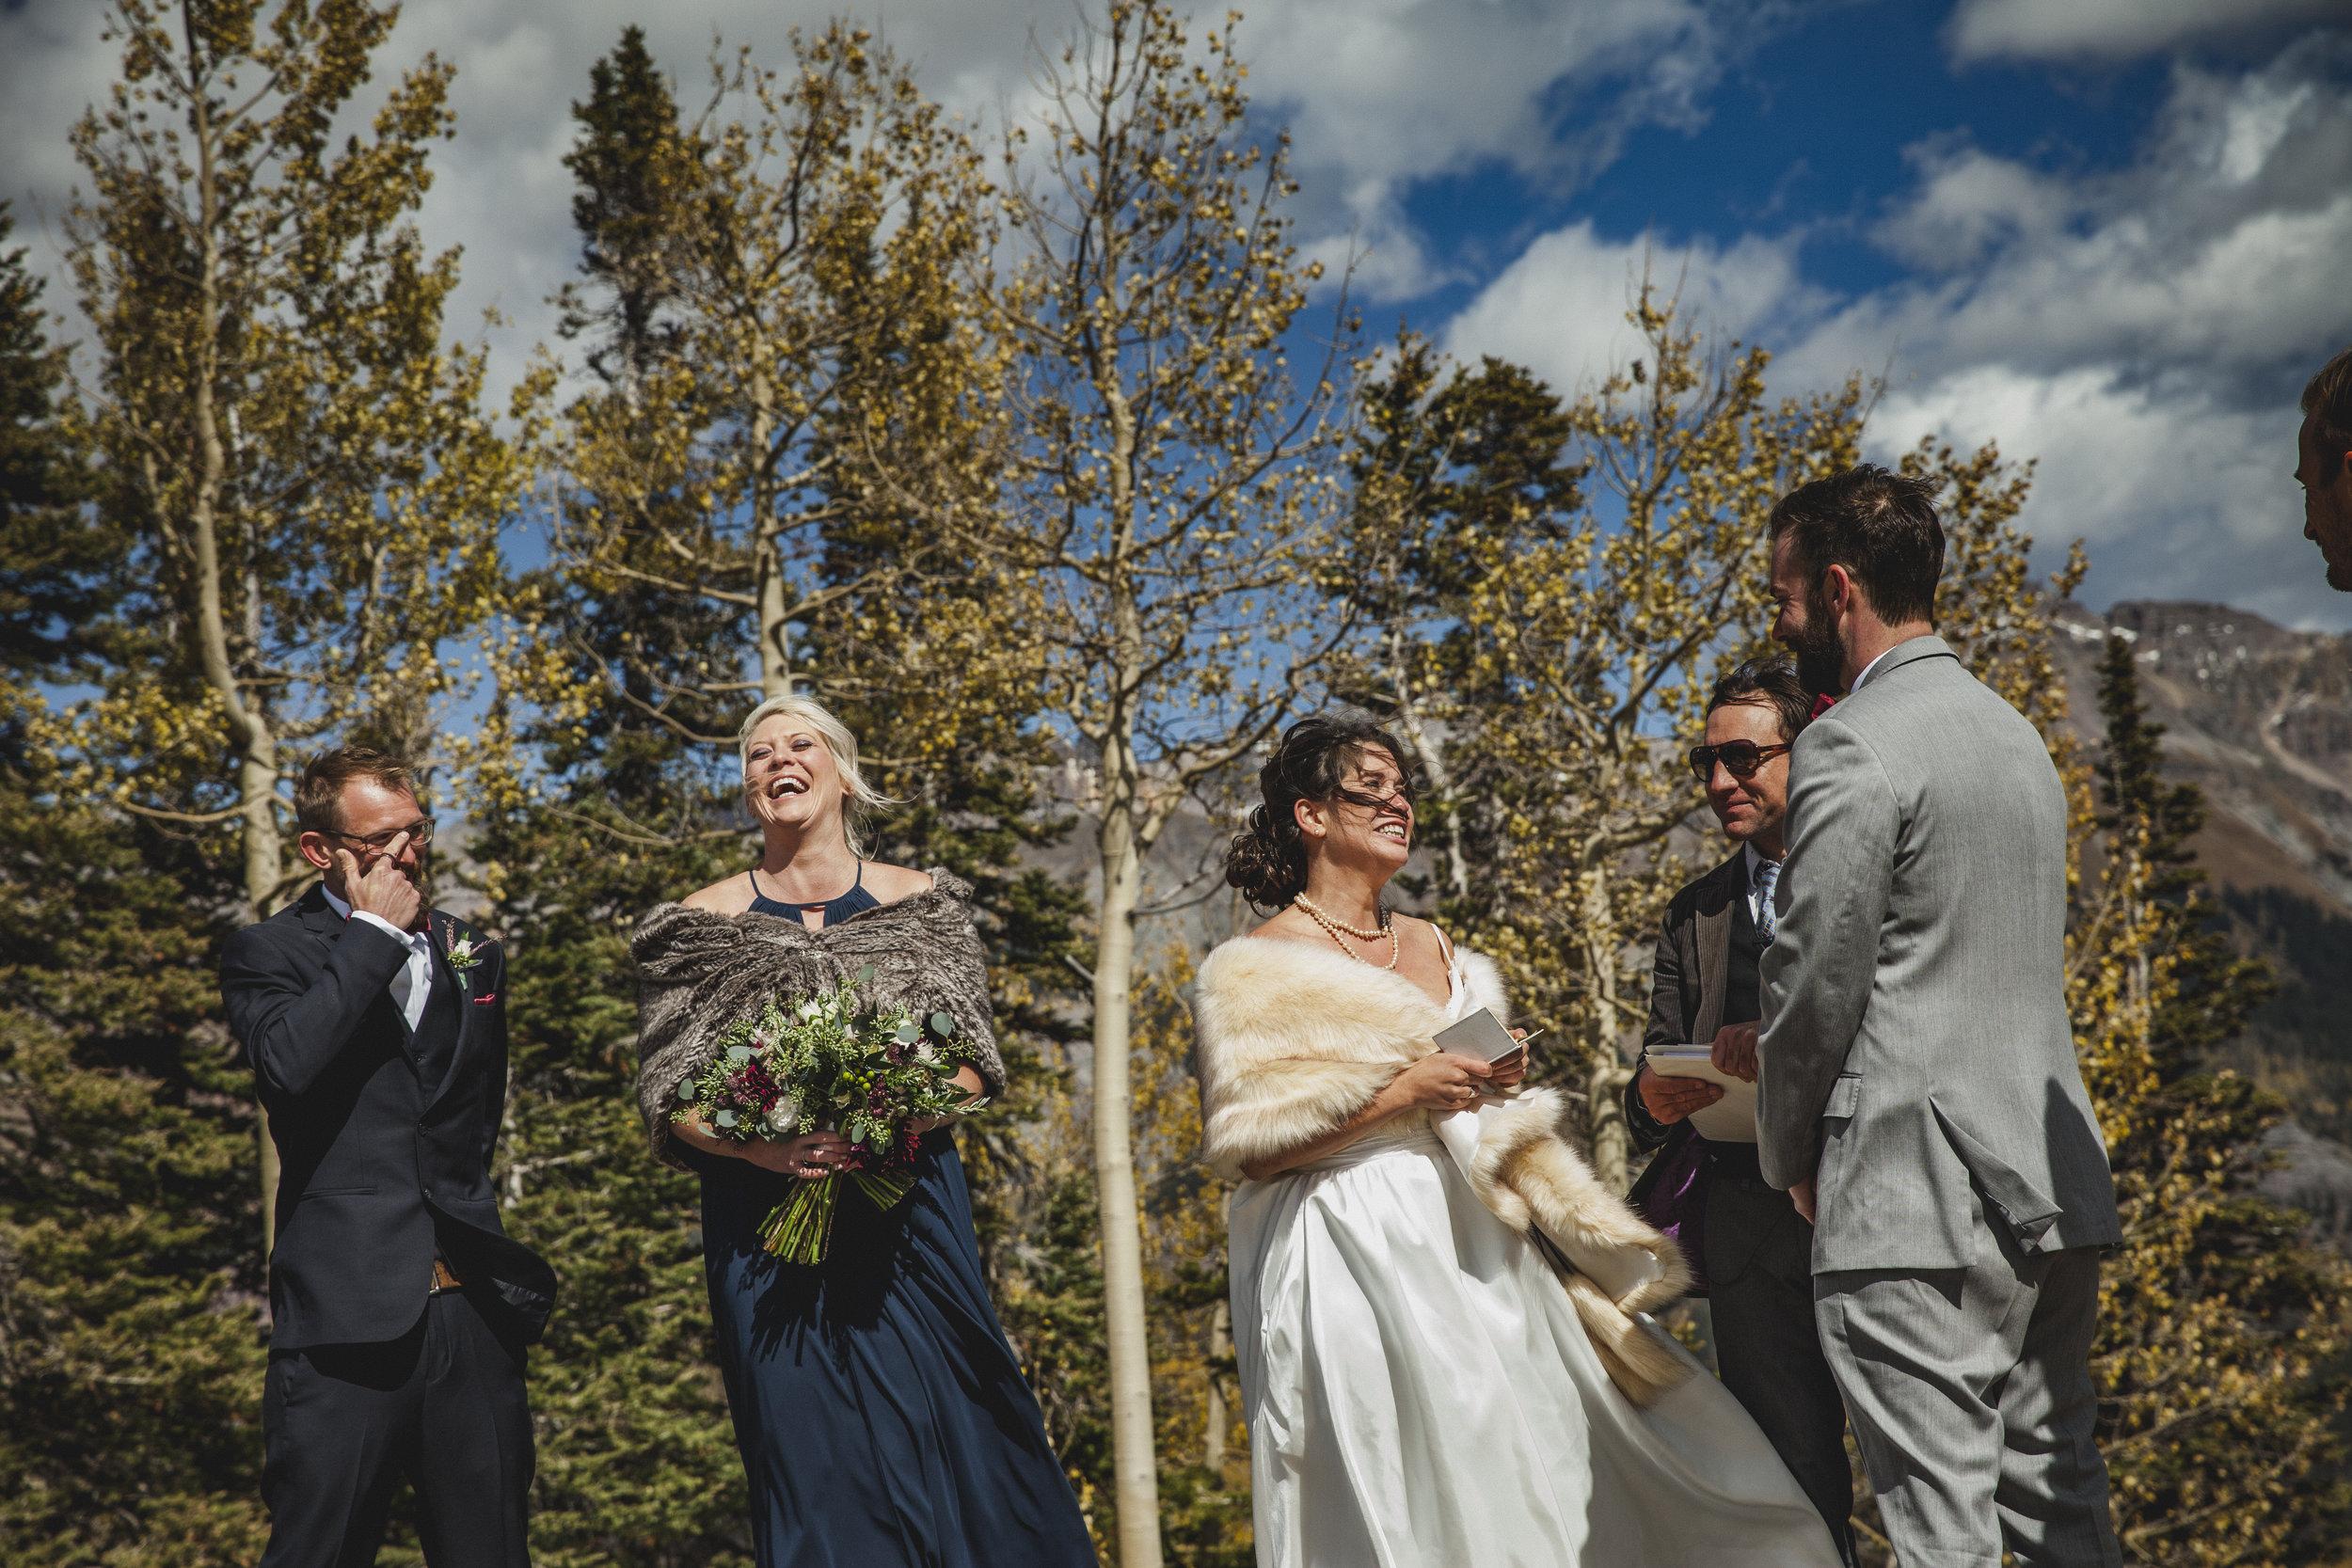 NE-LeahandAshtonphotography-Telluride-Wedding-Photography-6829.jpg